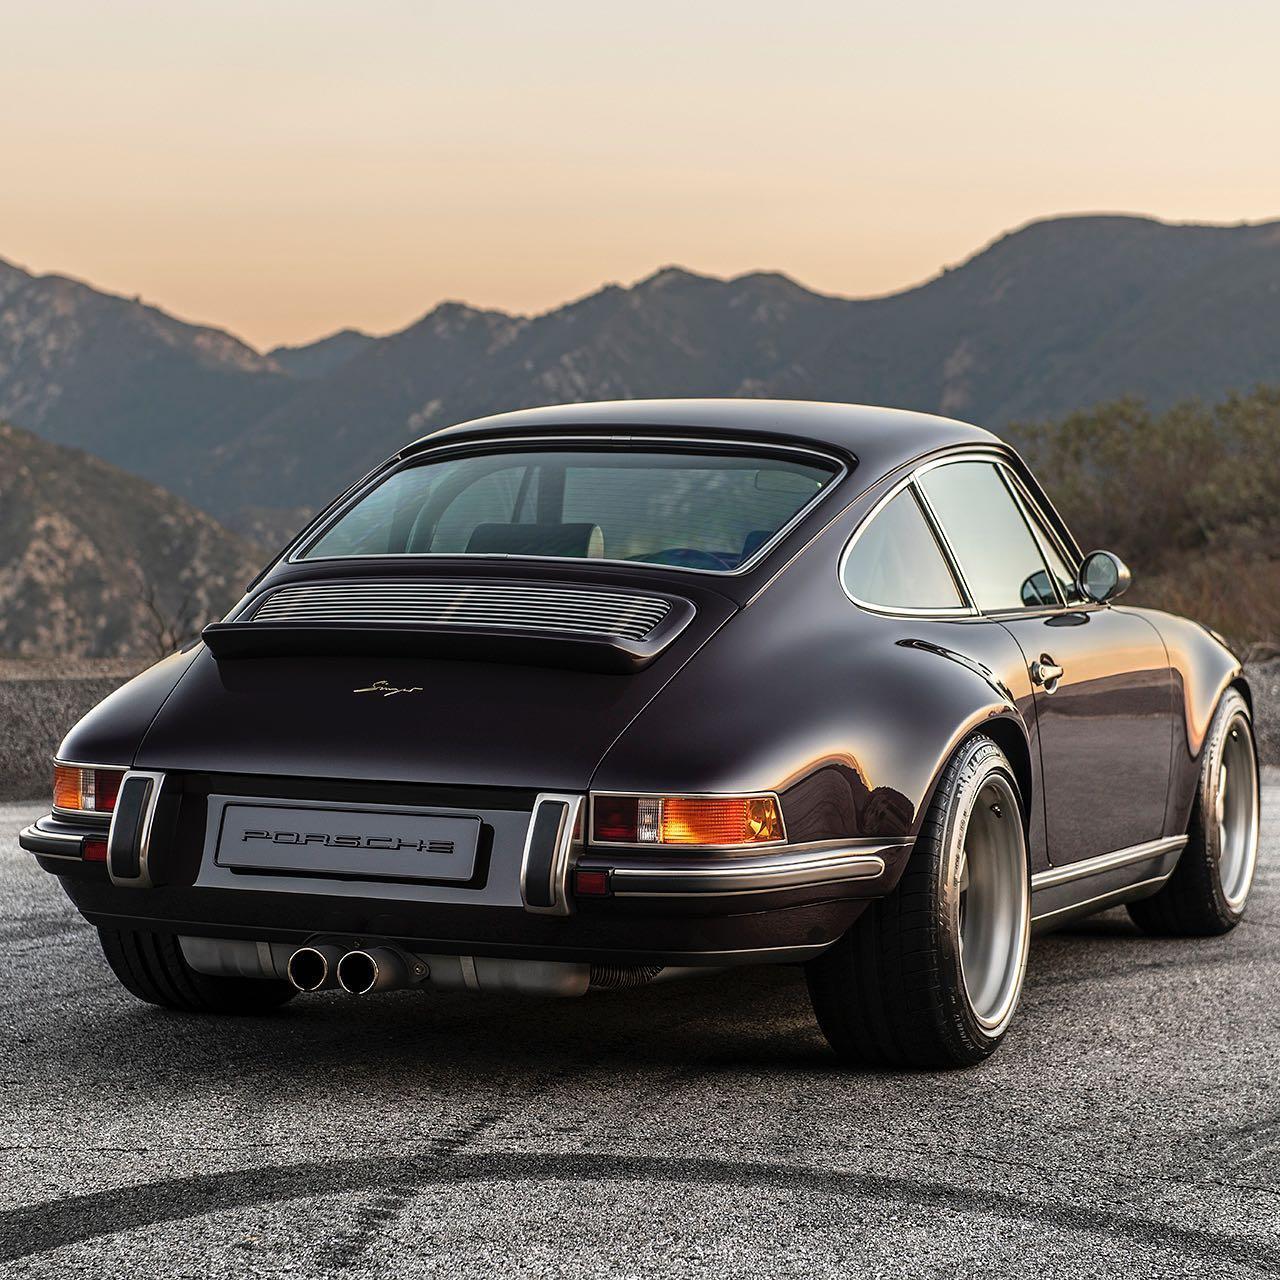 Singer_Anglet_Commission_Porsche_911_0001